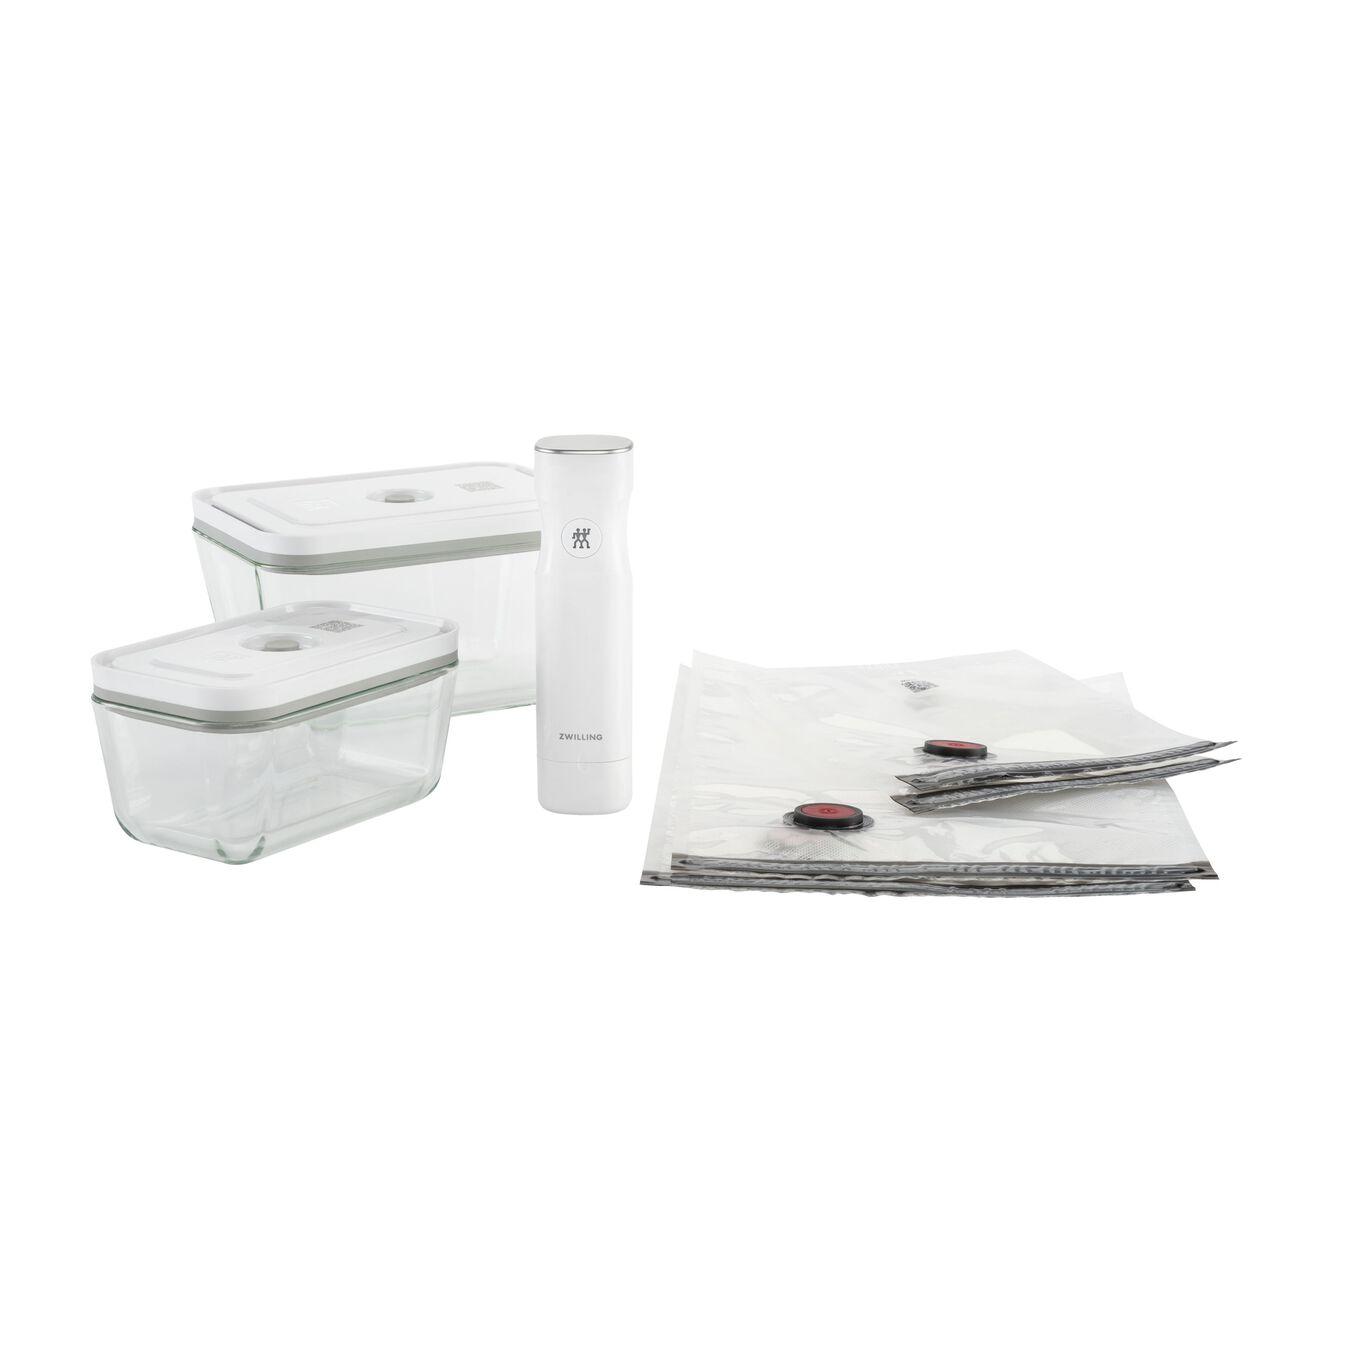 Primo set sottovuoto - vetro borosilicato / M/L, 7-pz., bianco,,large 1